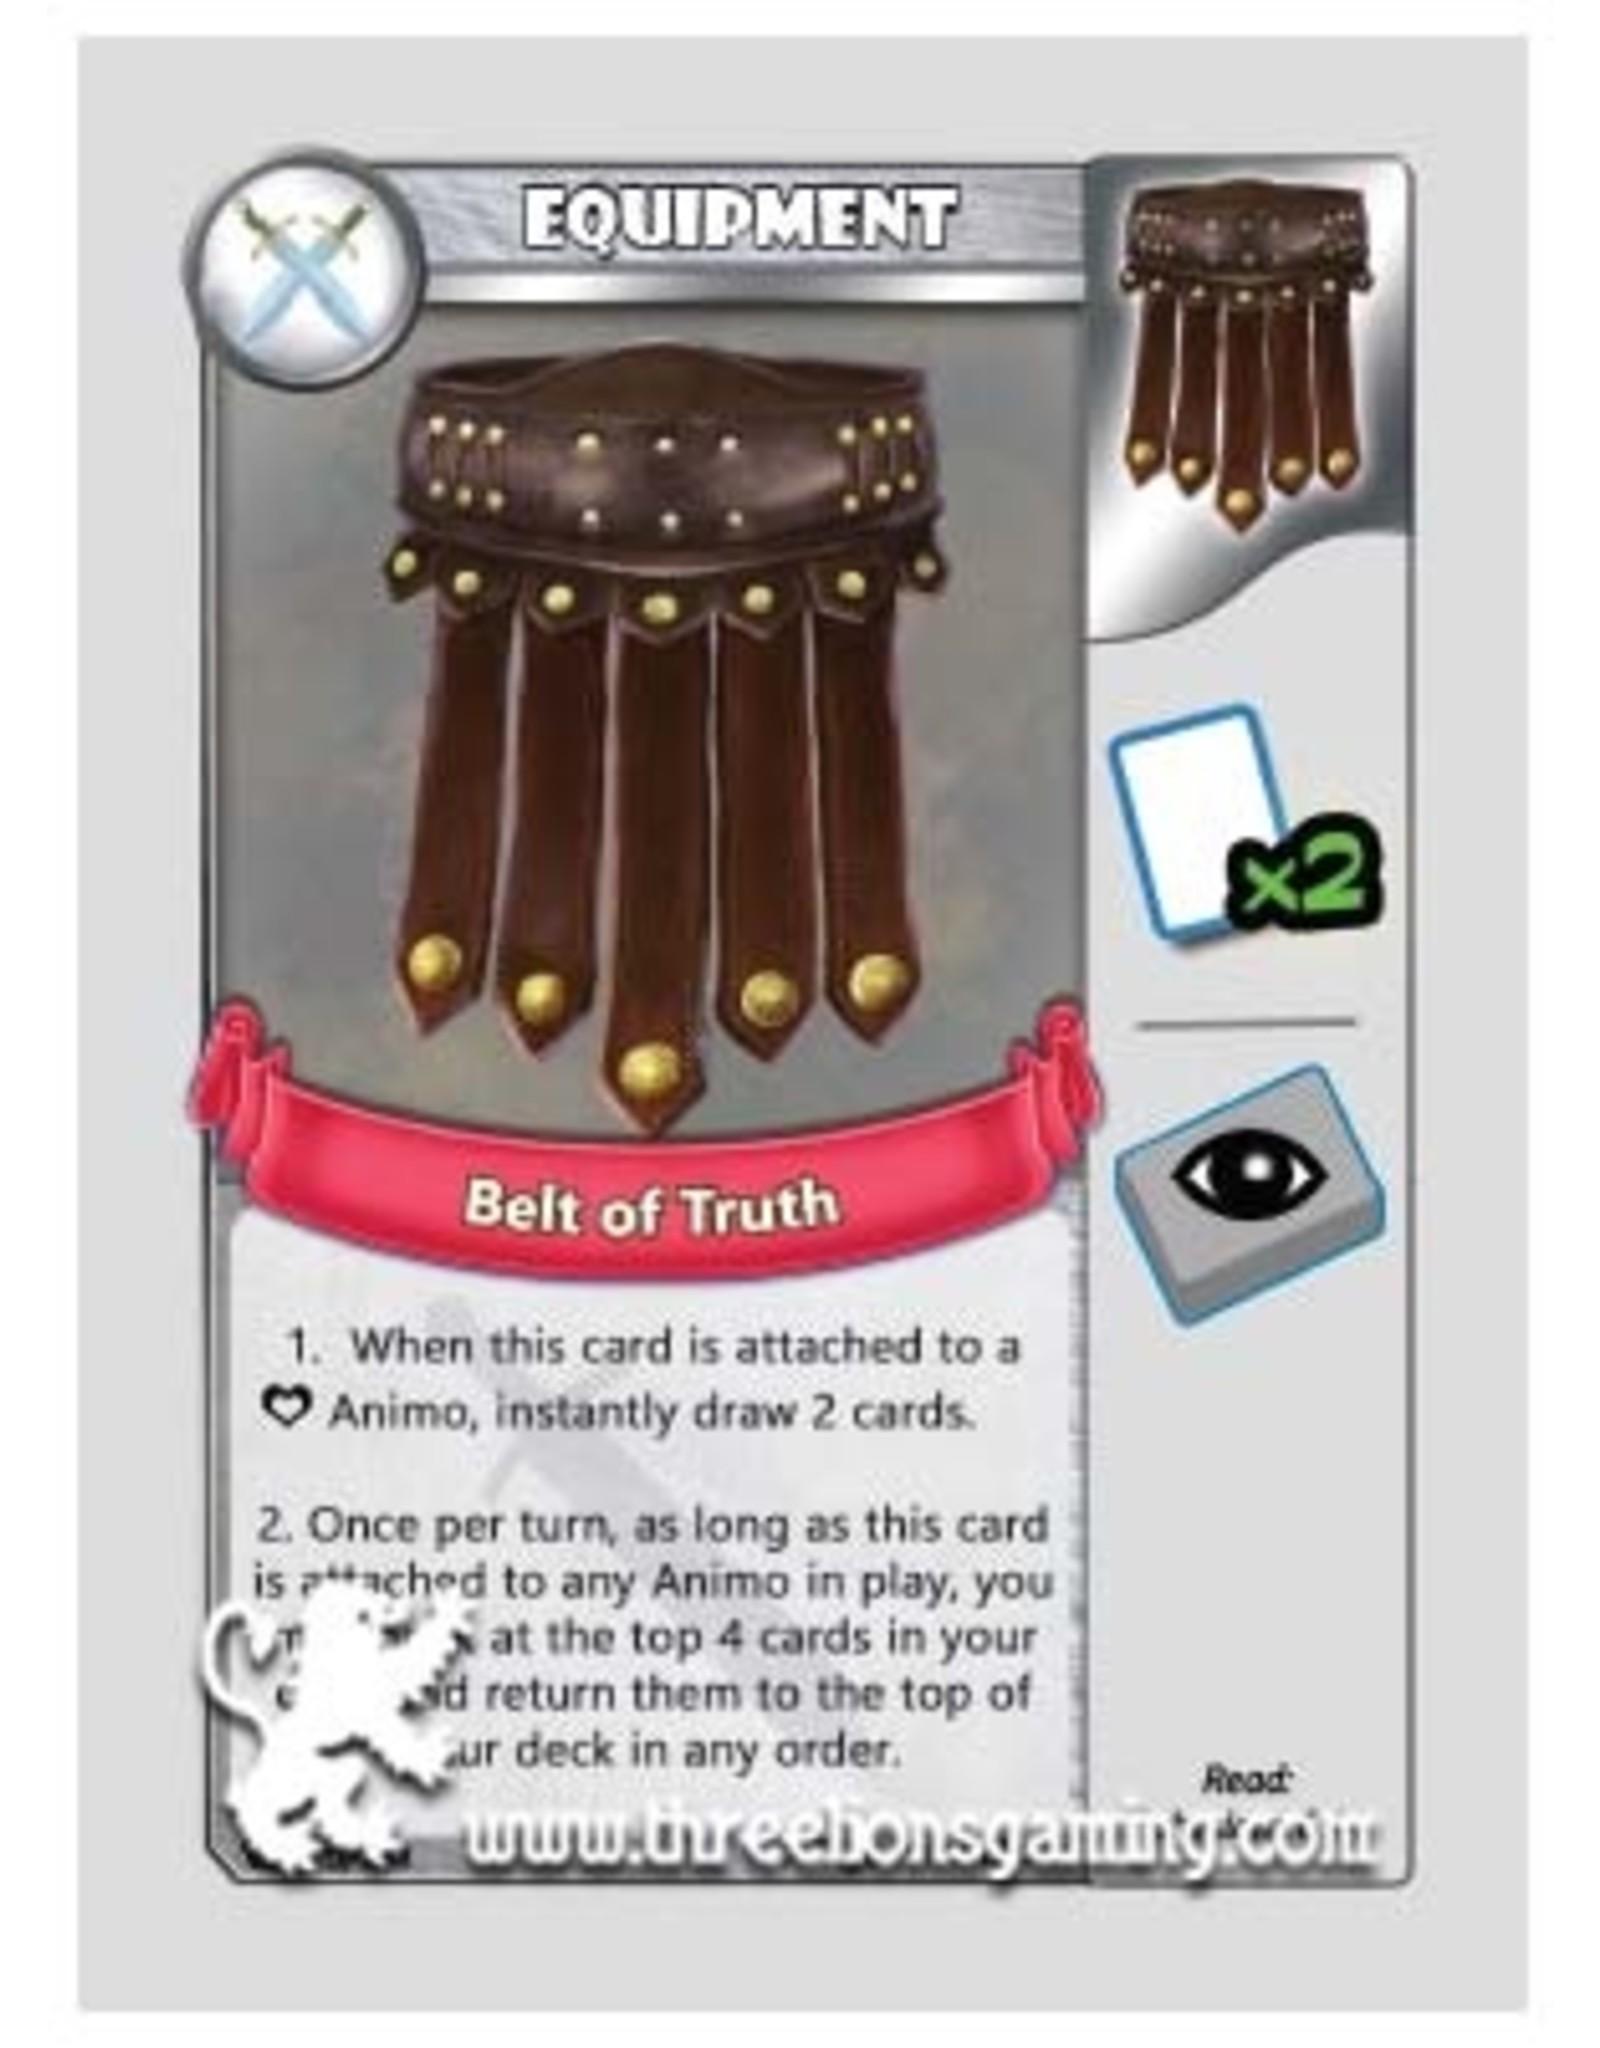 CT: Belt of Truth